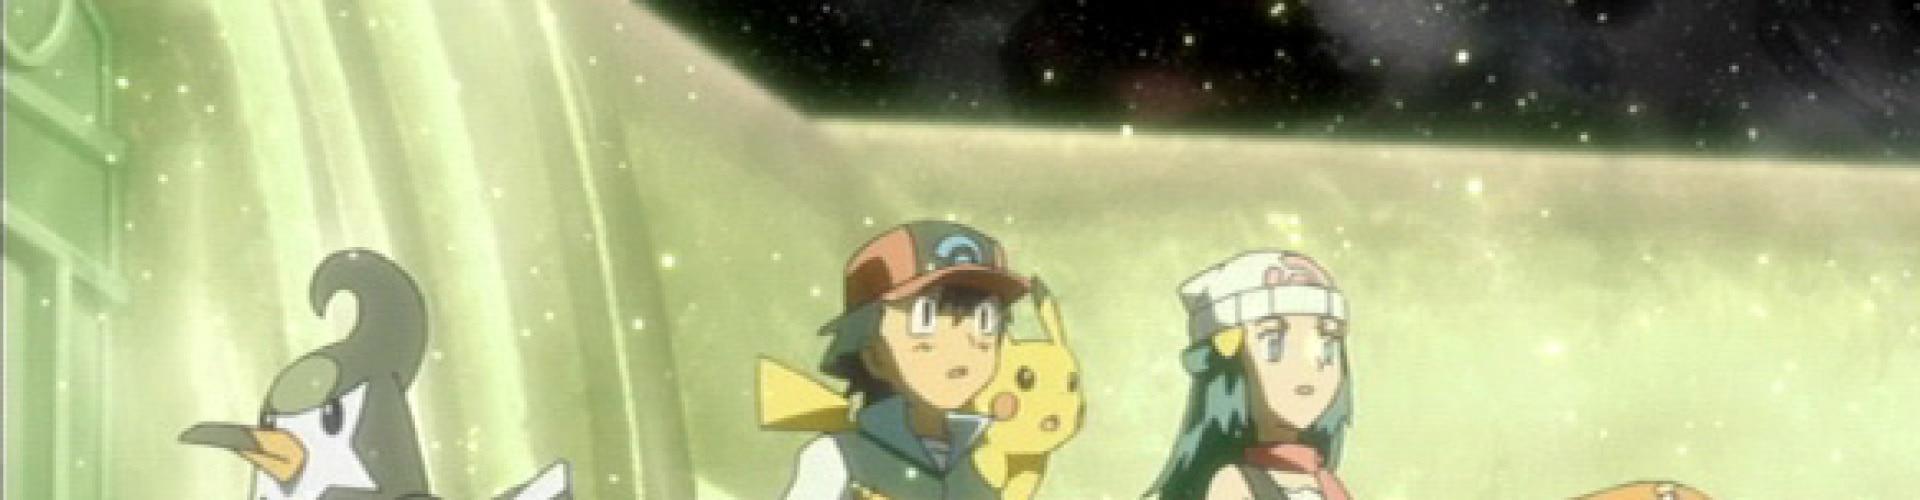 Watch Pokemon: The Rise Of Darkrai Online